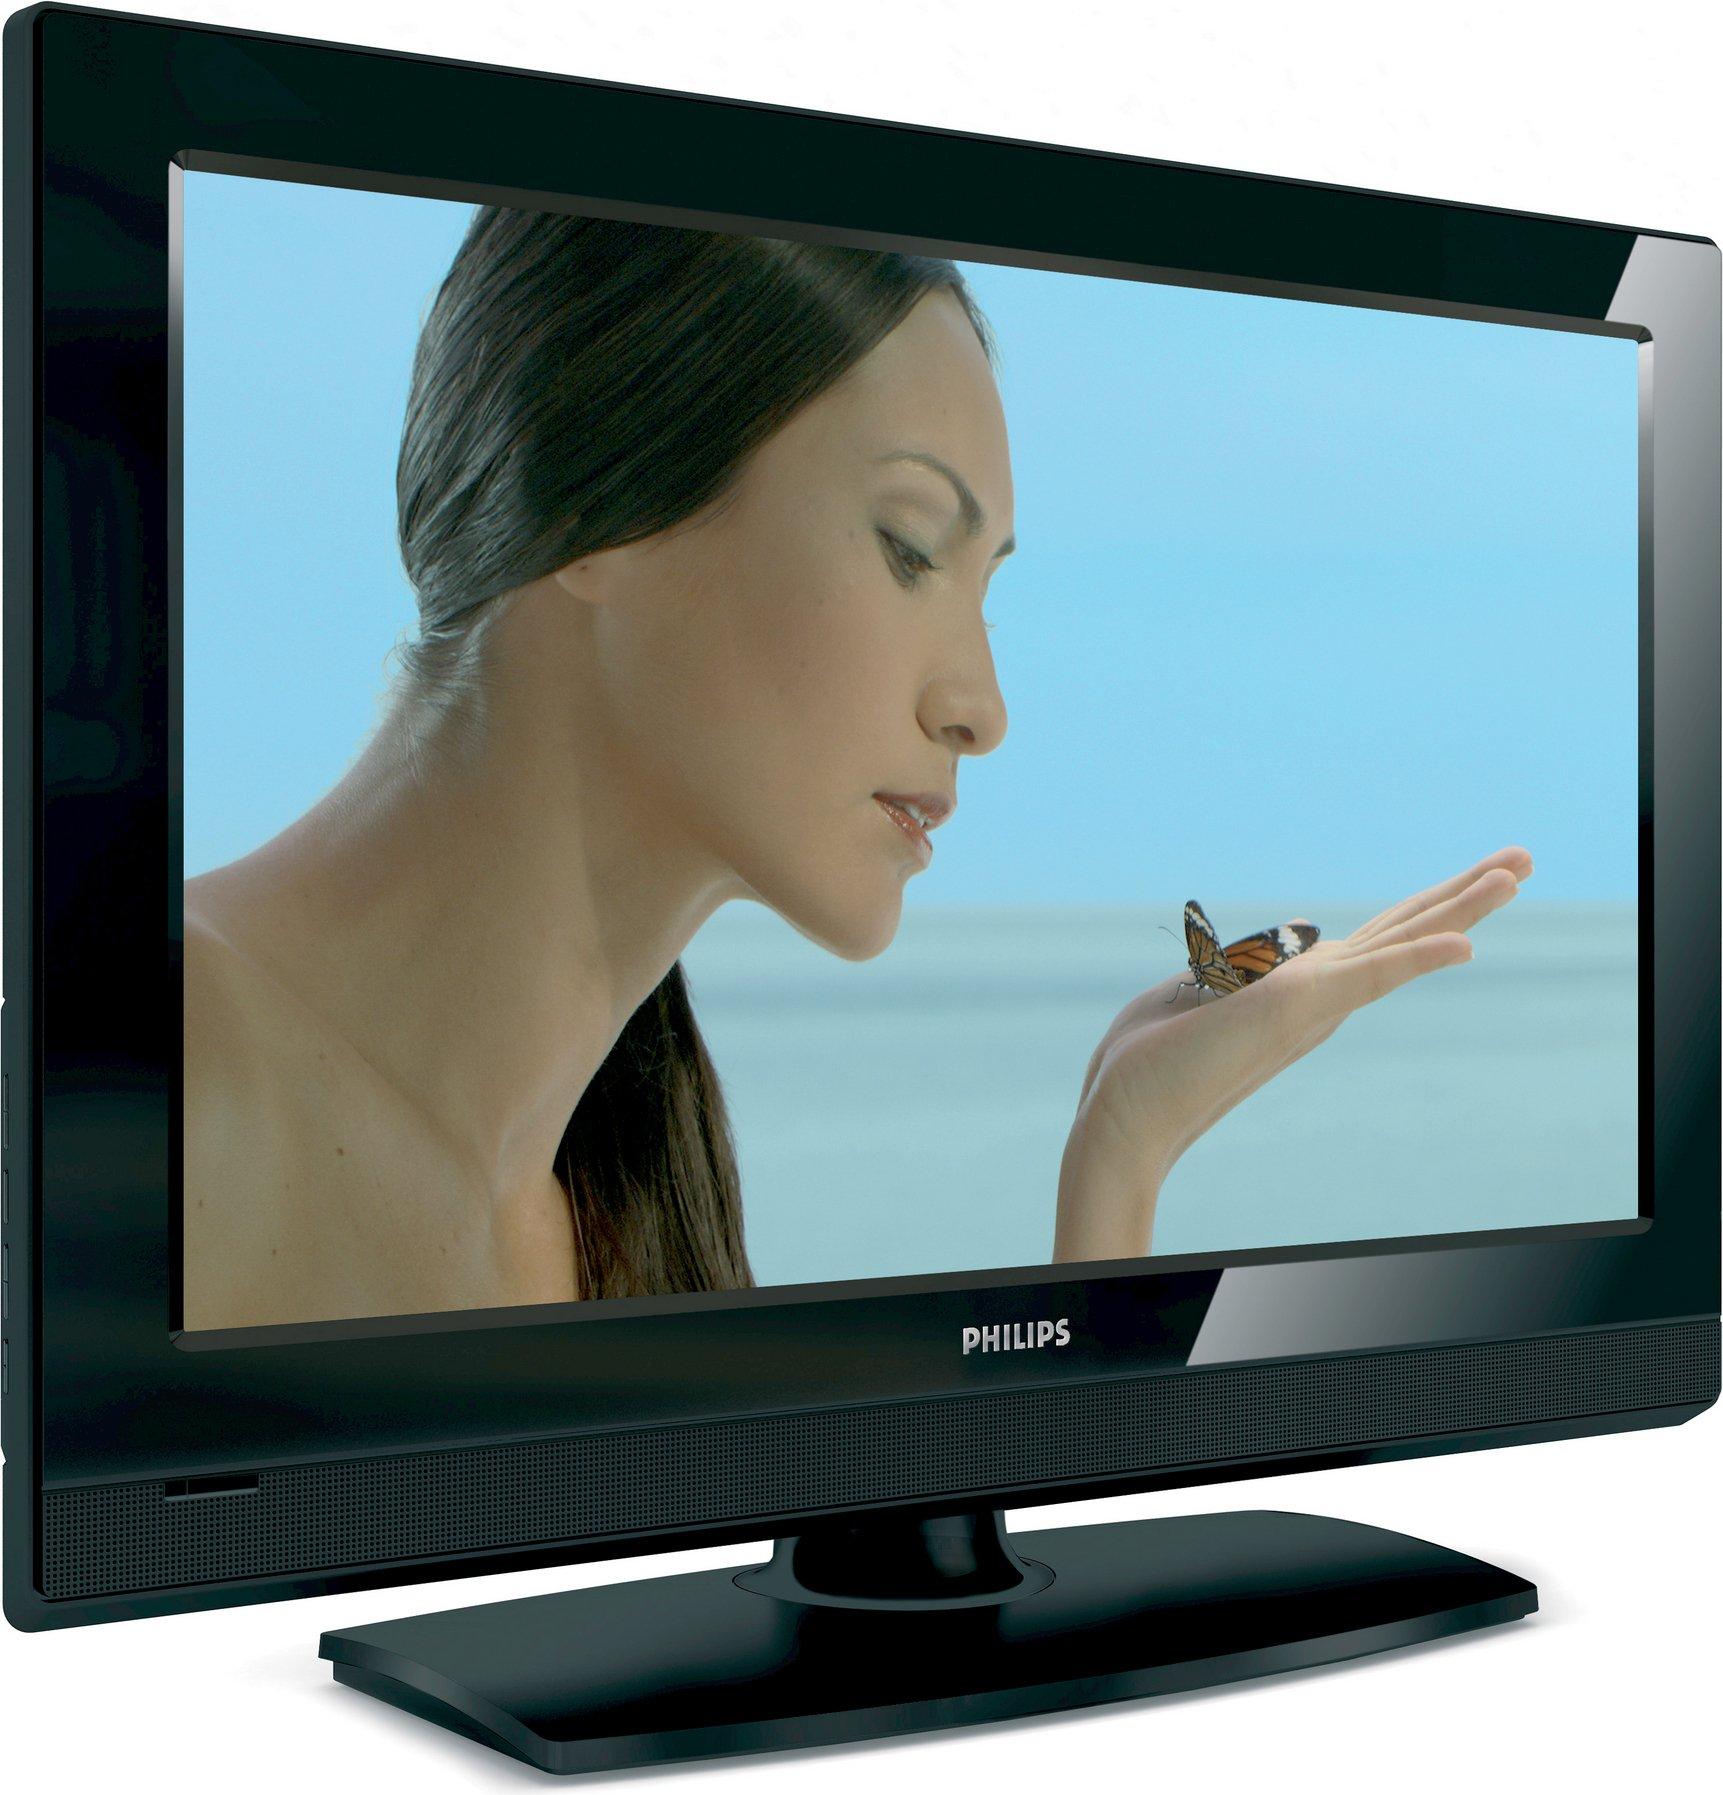 Philips Flat TV panorámico 32PFL3312 - Televisor LCD HD ready ...